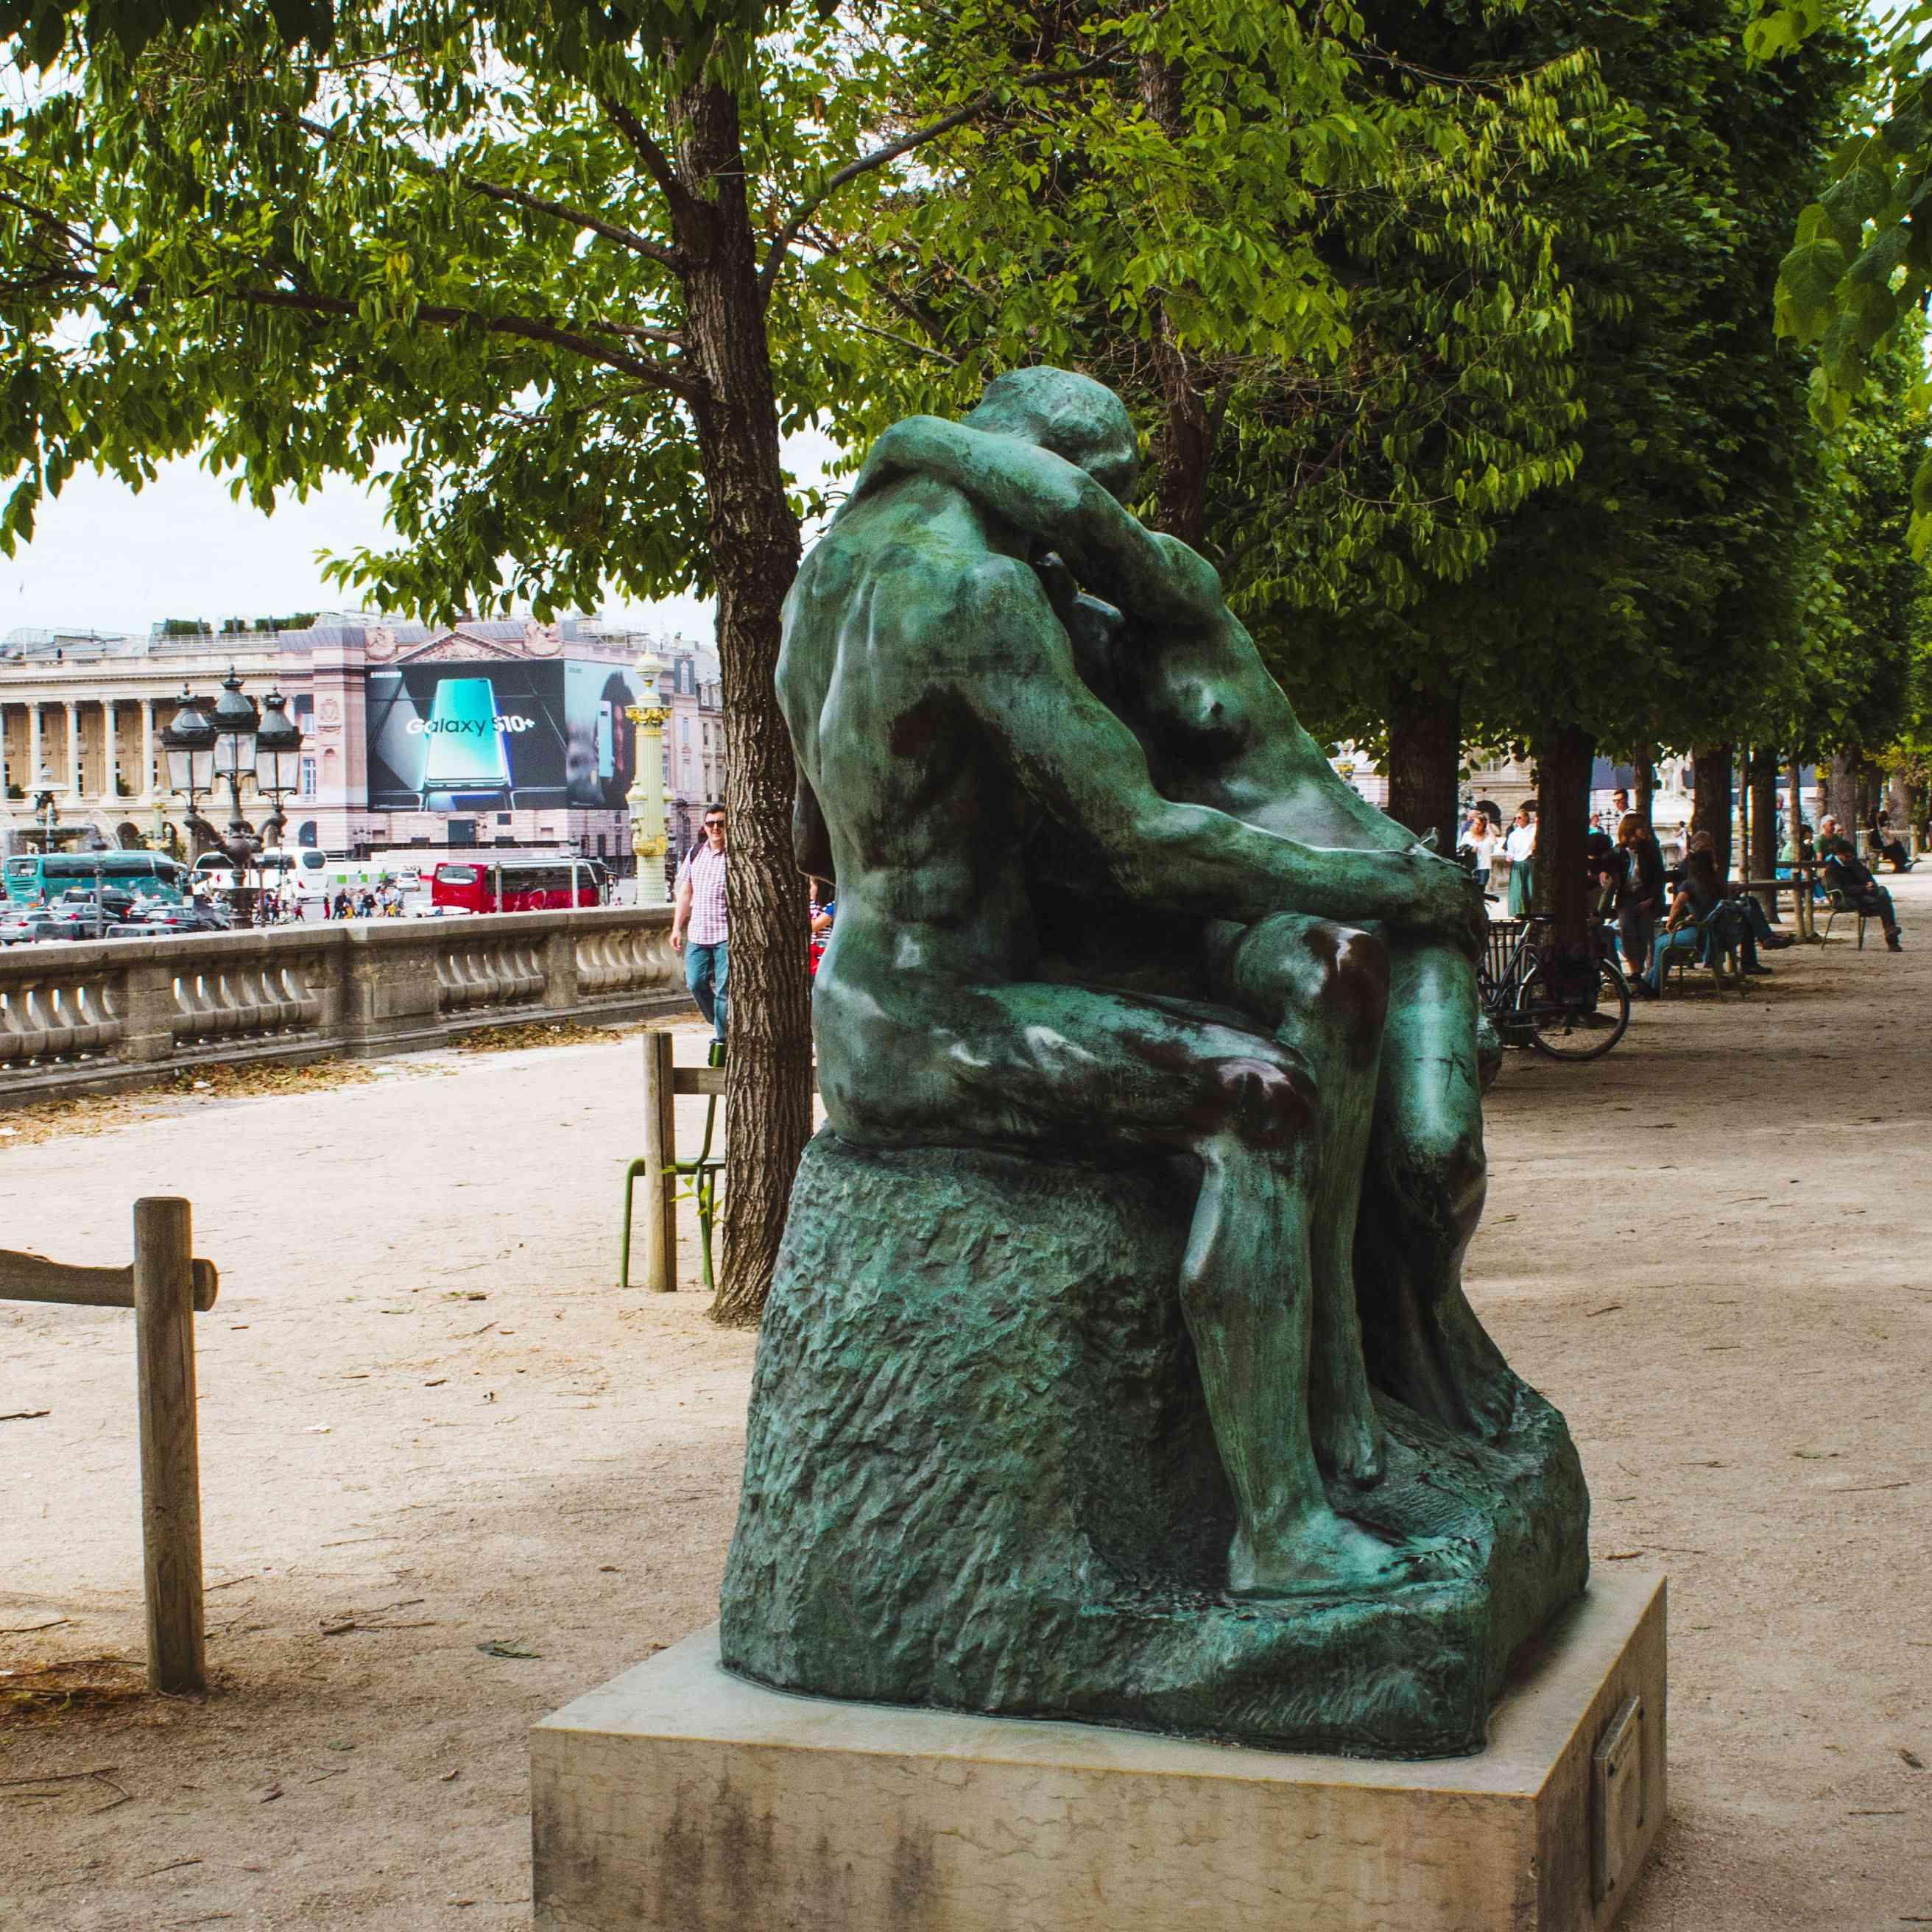 Statue outside of Orangerie